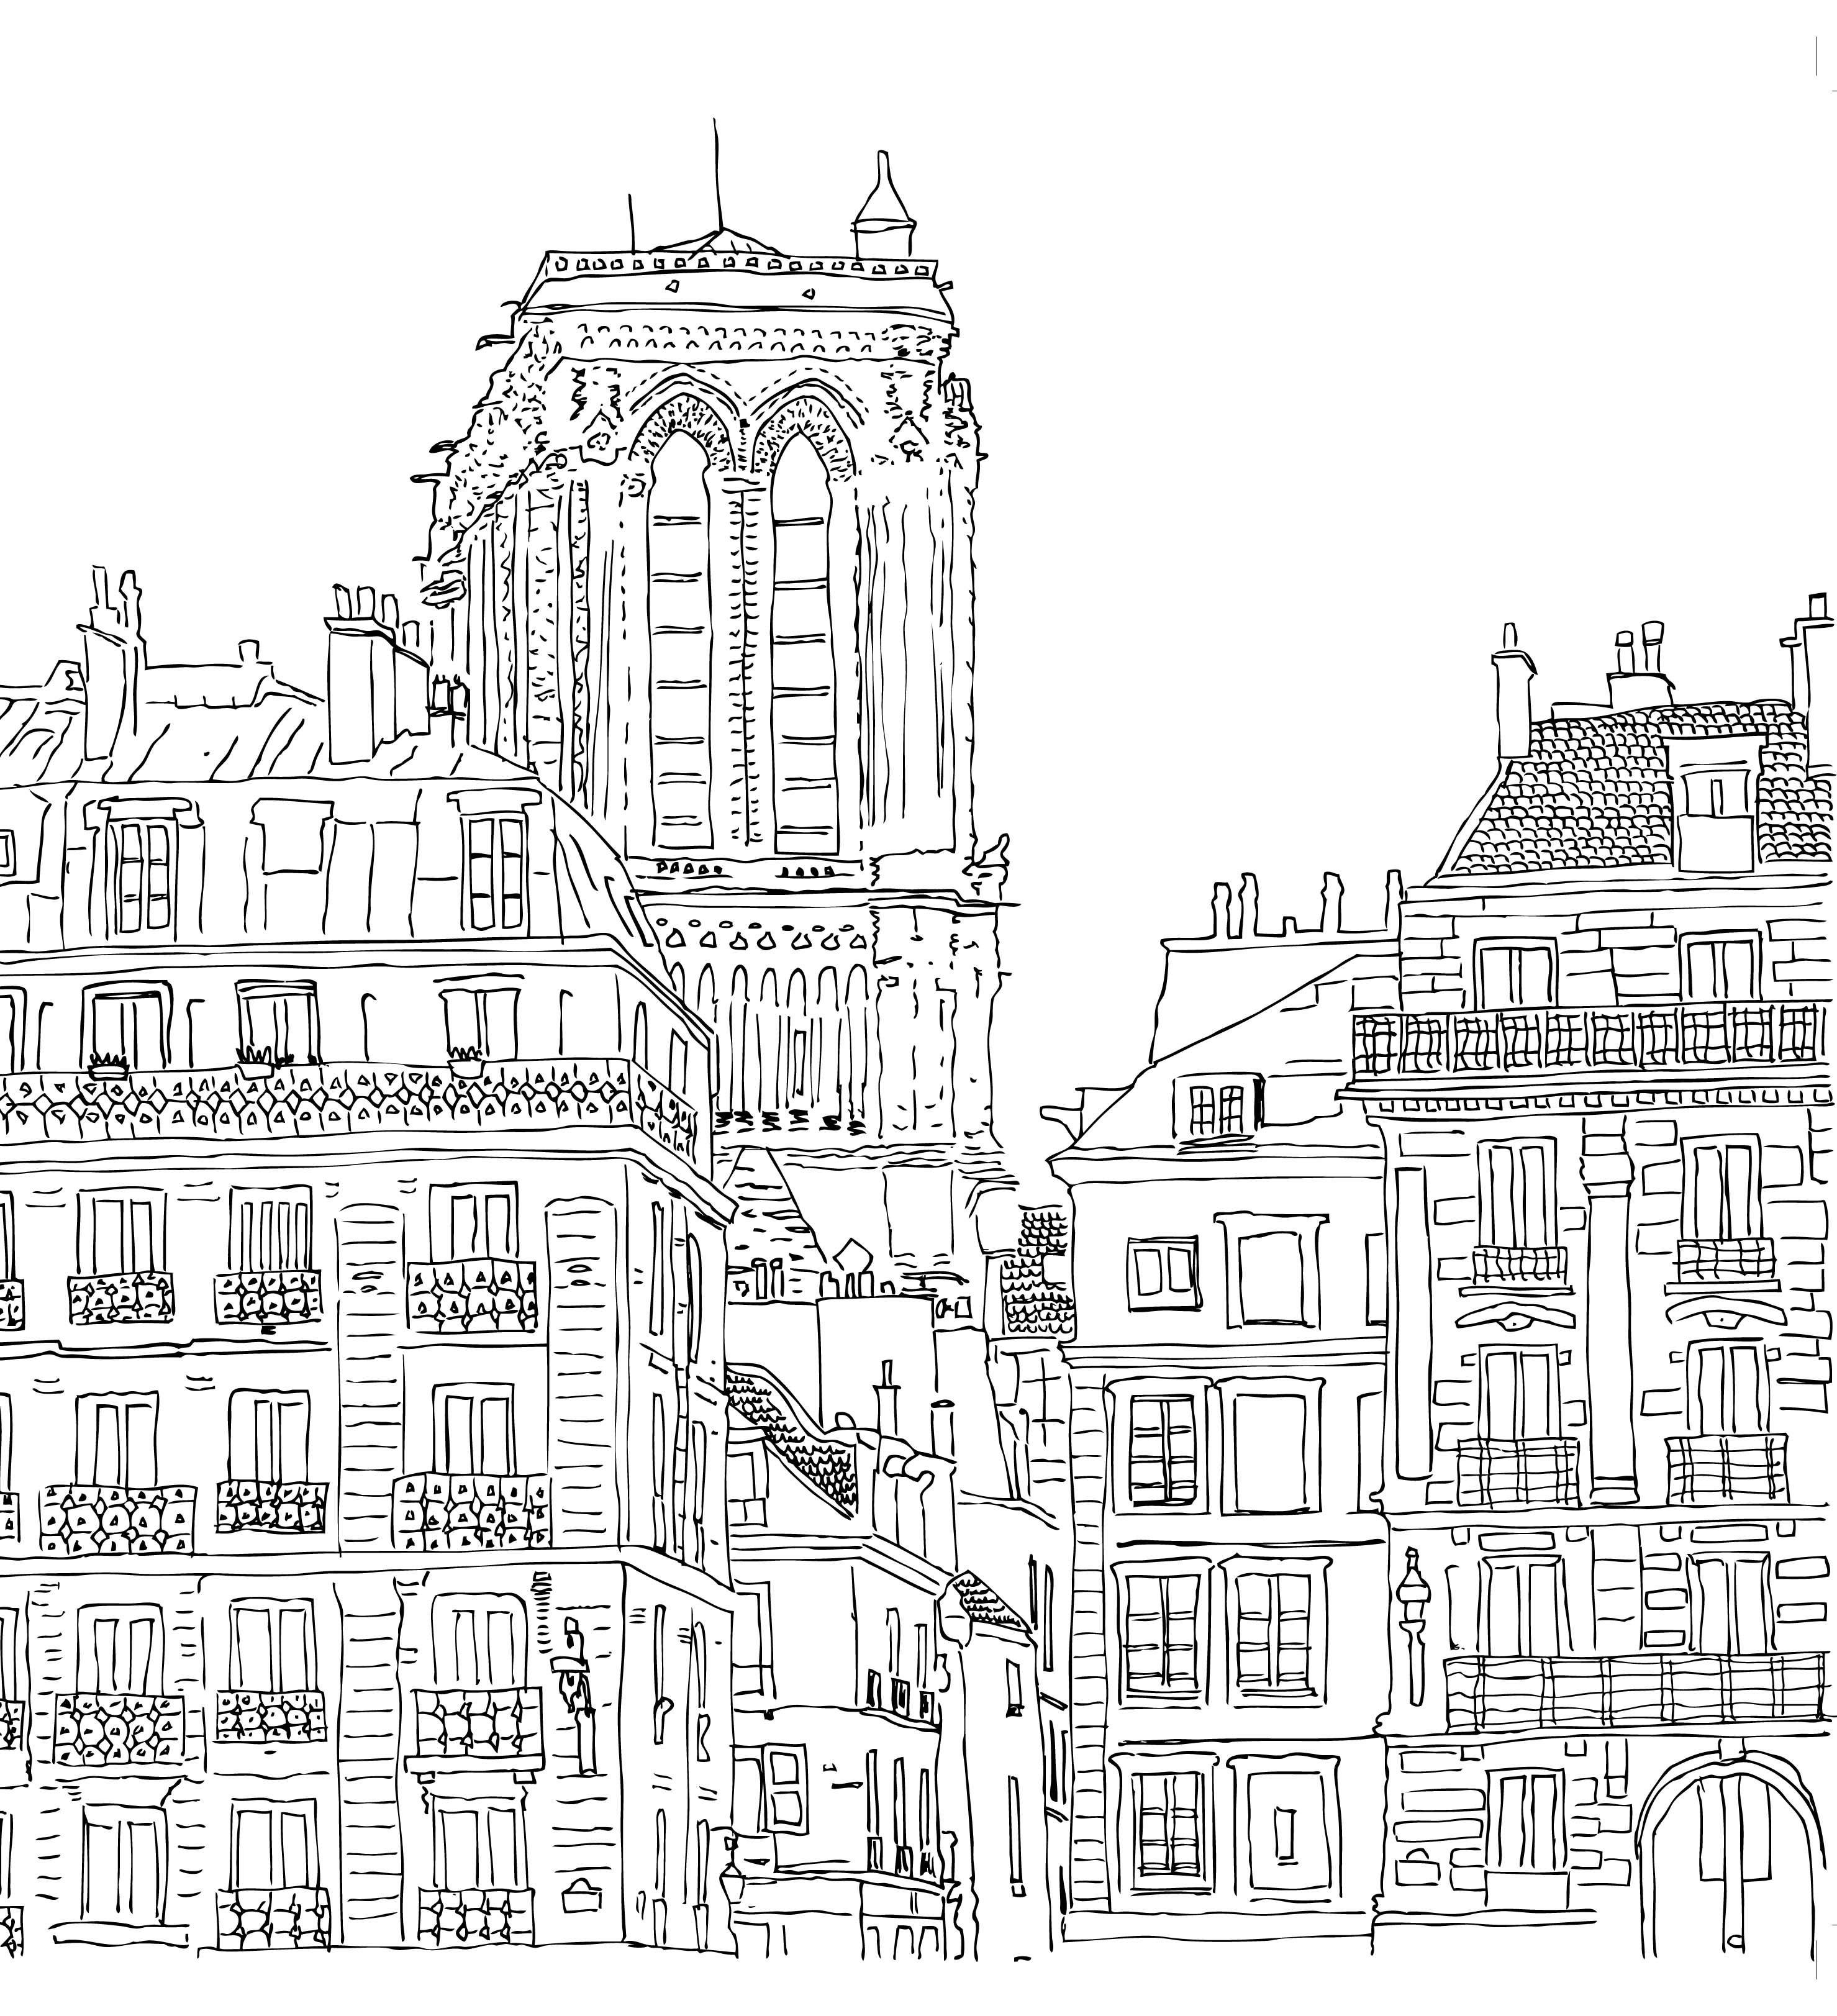 Paris coloring book for adults - Notre Dame Coloriage Adulte Anti Stress Paris Fashion Adult Coloring